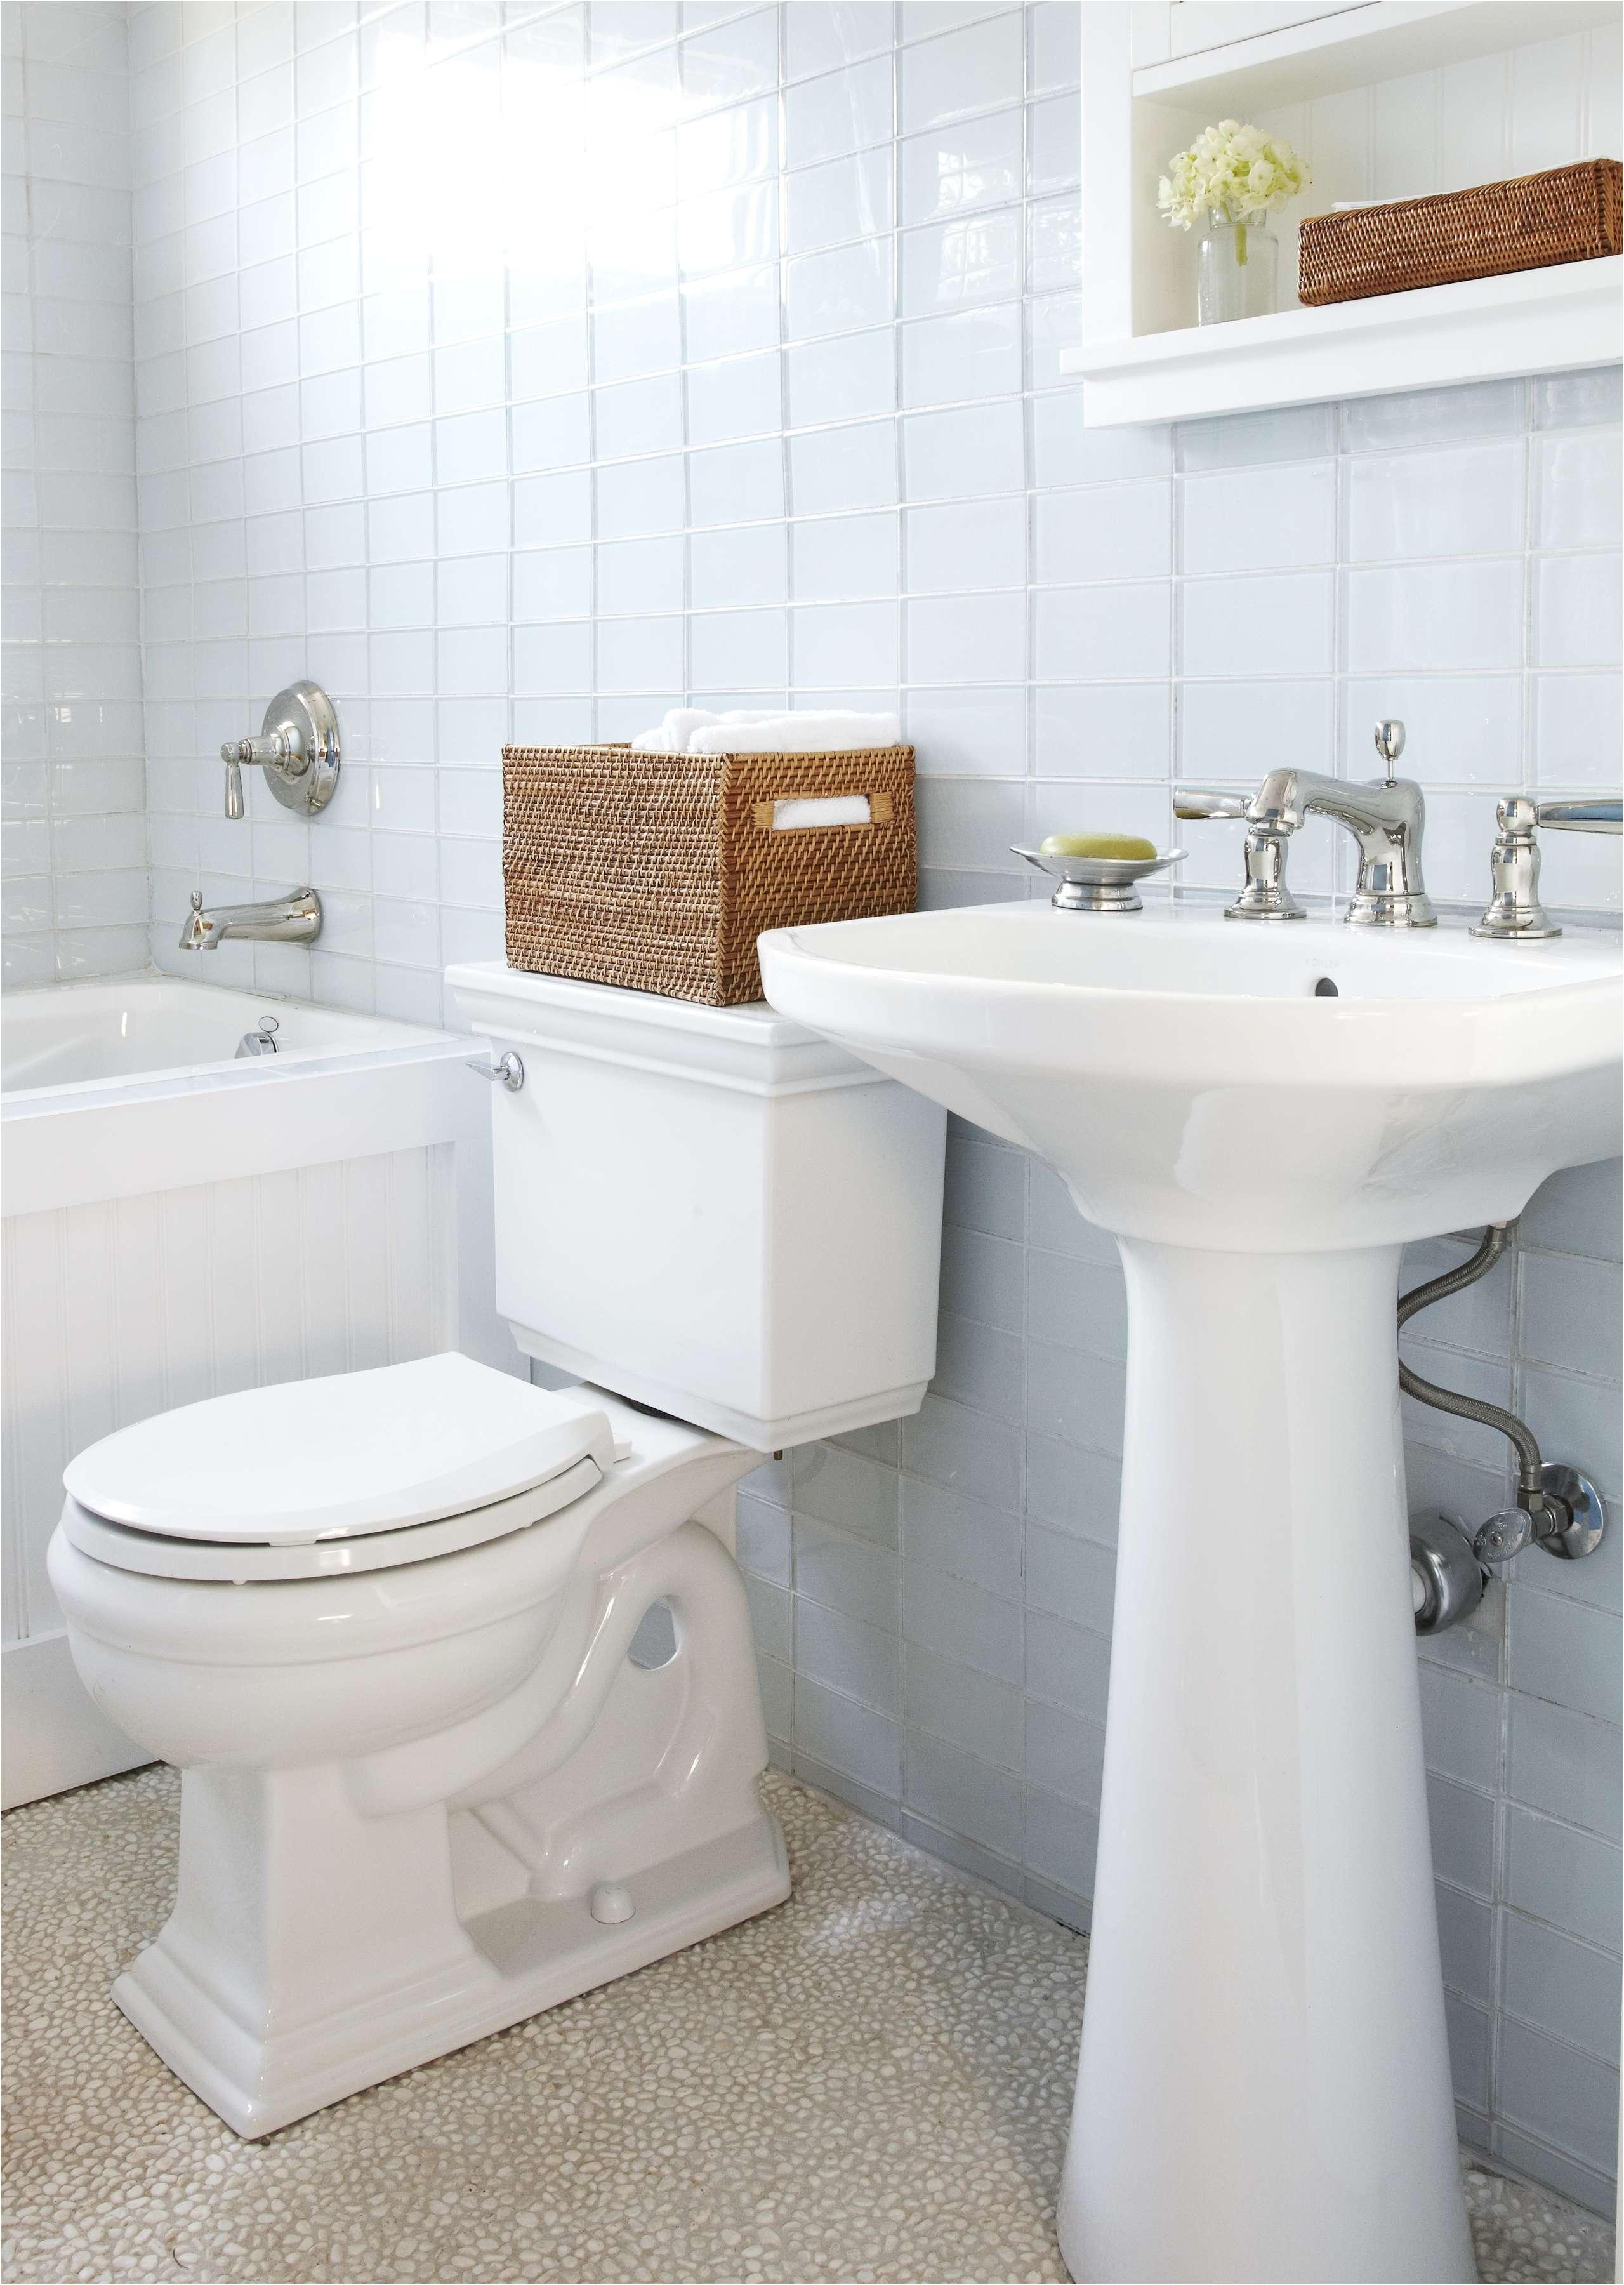 Appealing Italian Bathroom Tiles Tiles for Small Bathroom Floor